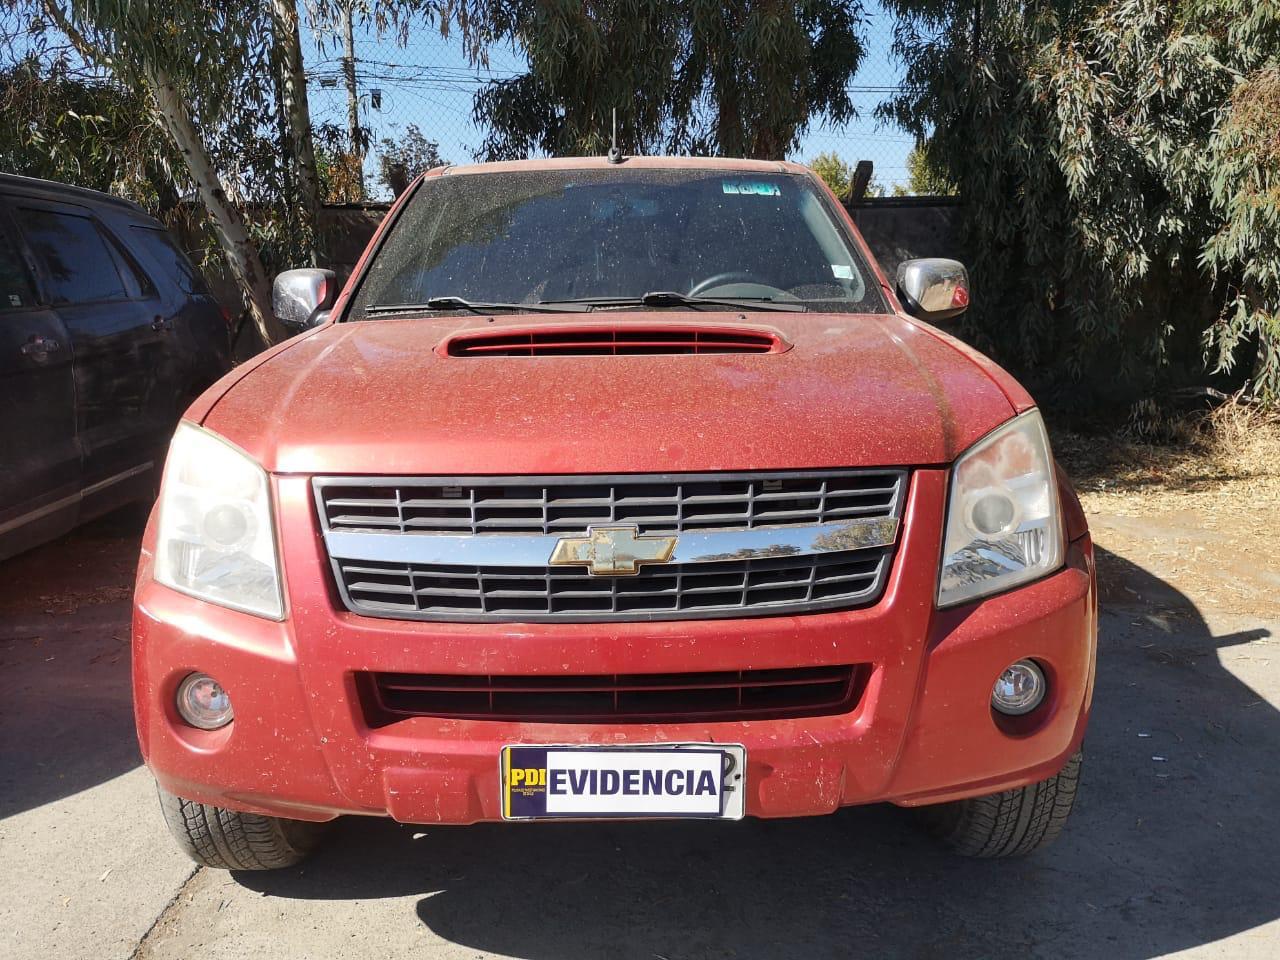 En Graneros PDI recuperó camioneta robada